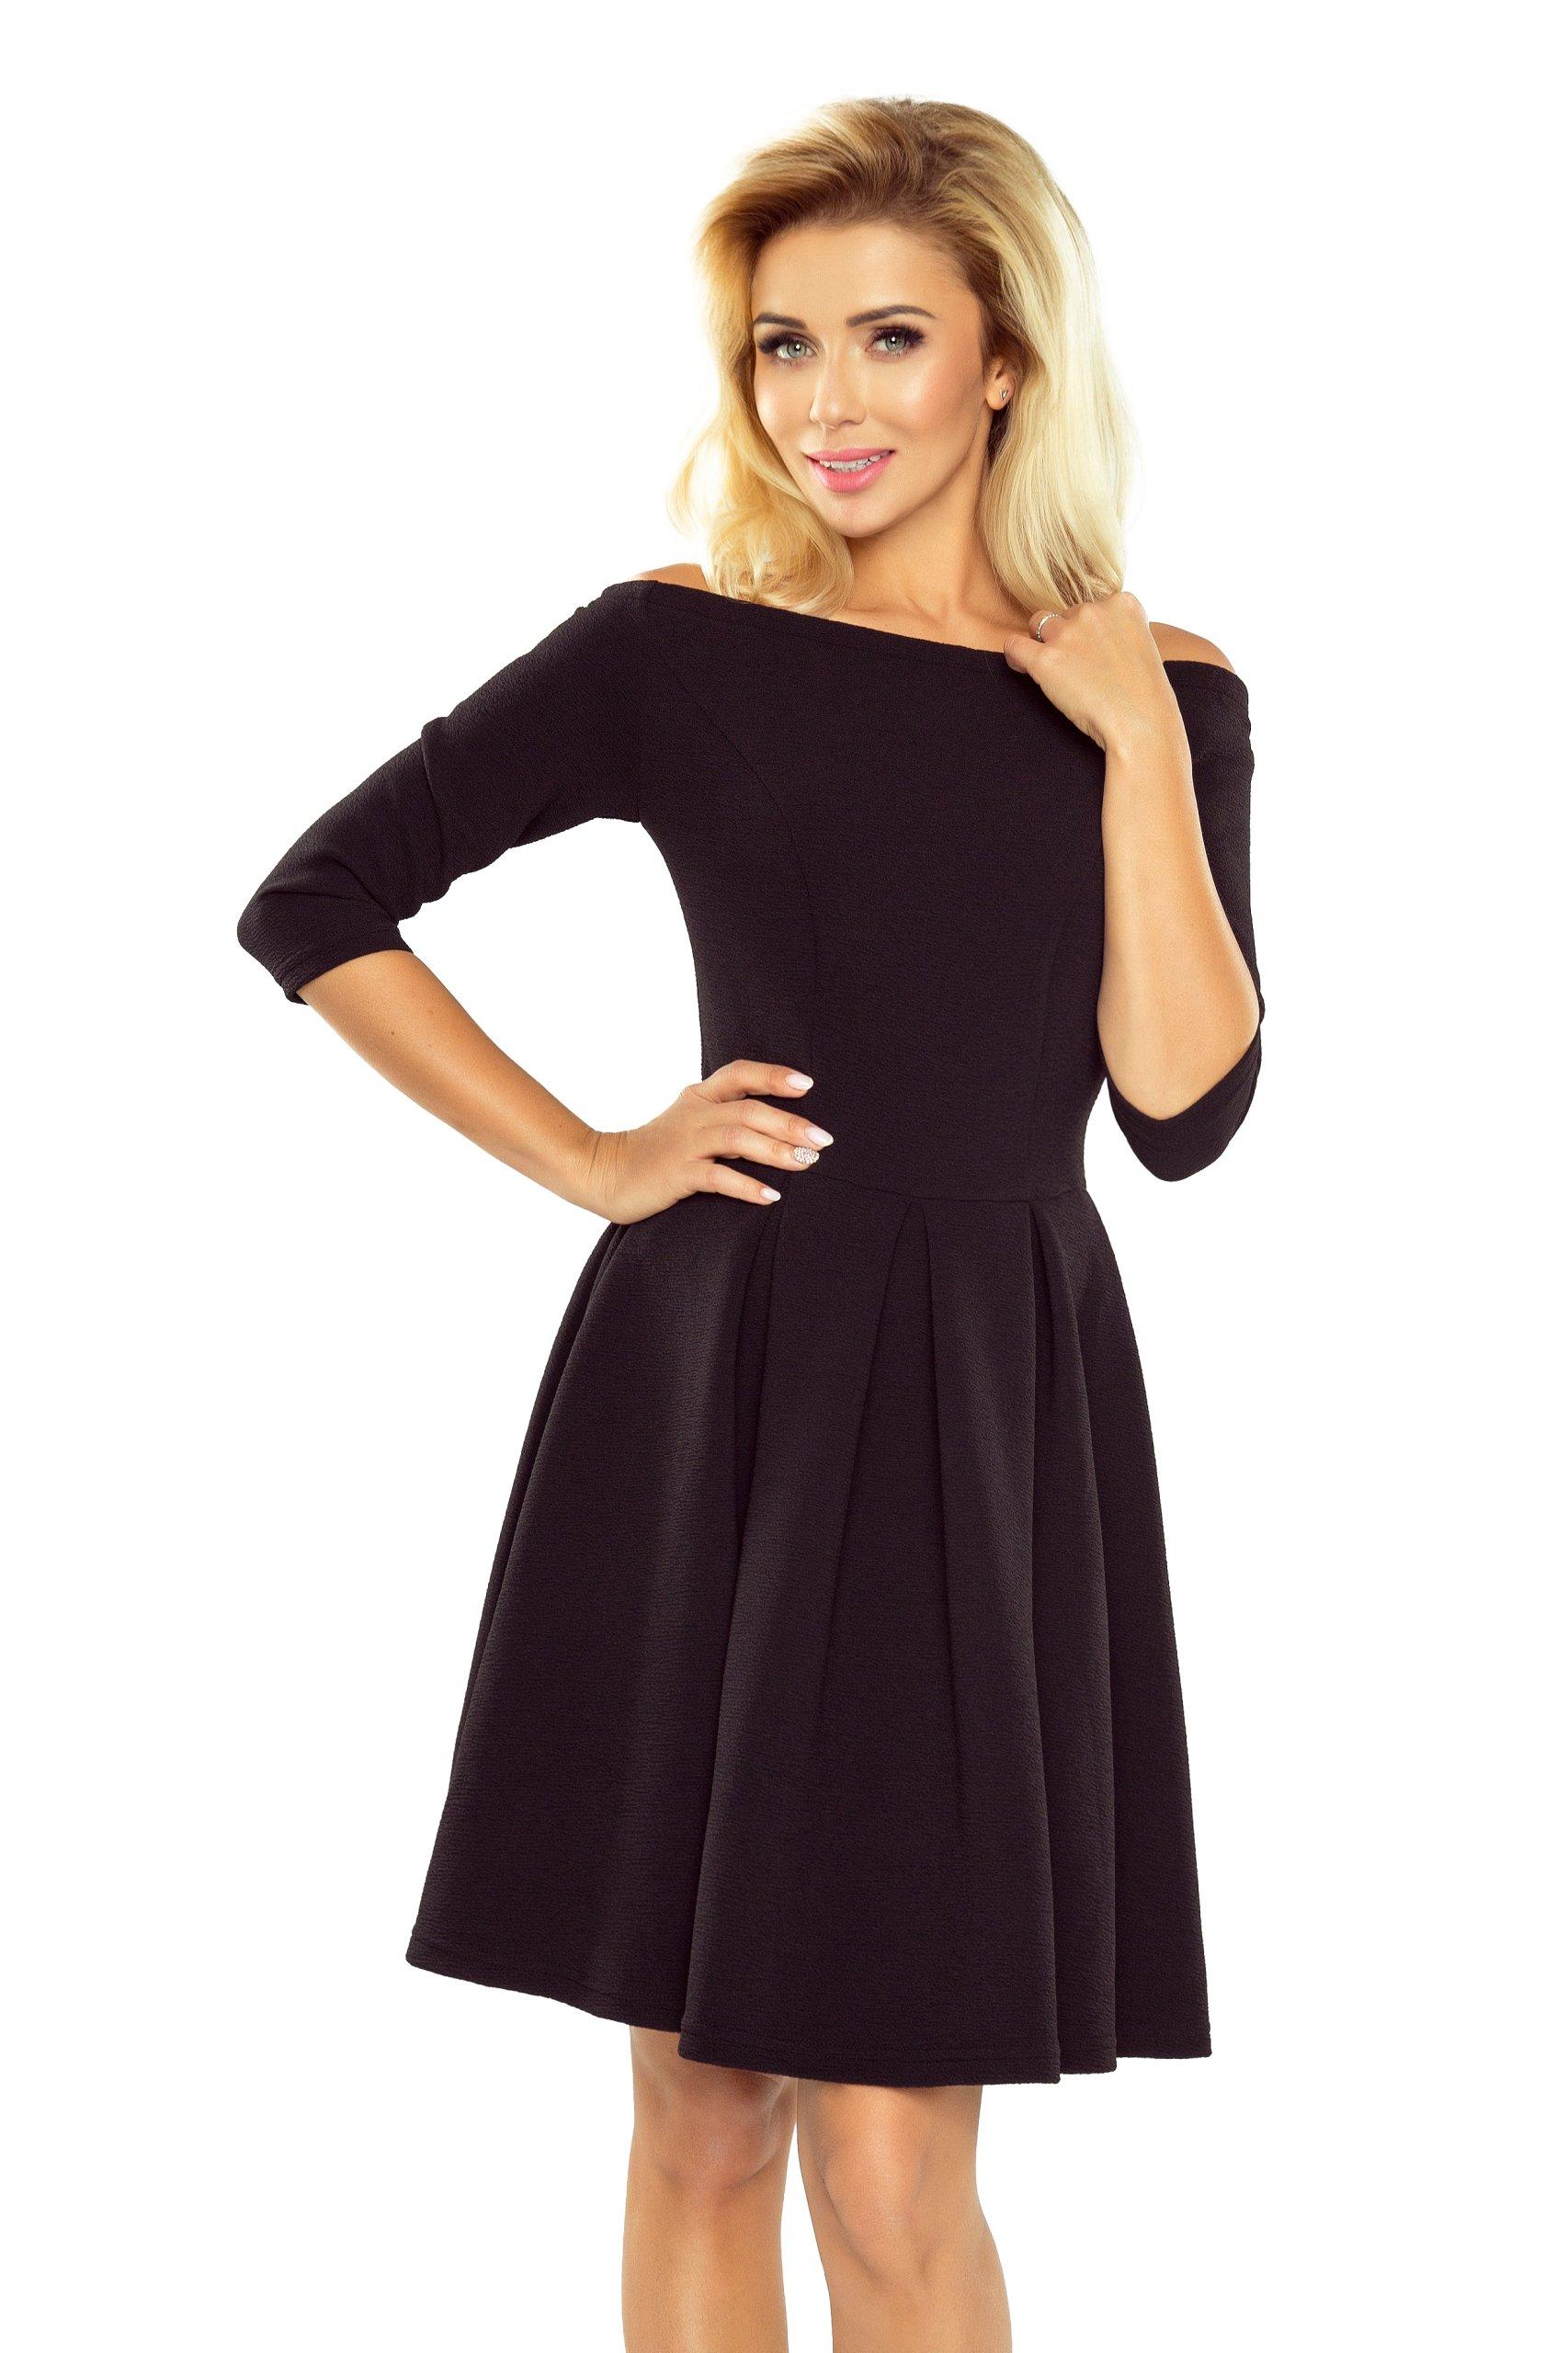 5849f1f50b7056 MODNA Sukienka Suknia WIECZOROWA NA BAL 163-1 M 38 - 7272330275 ...